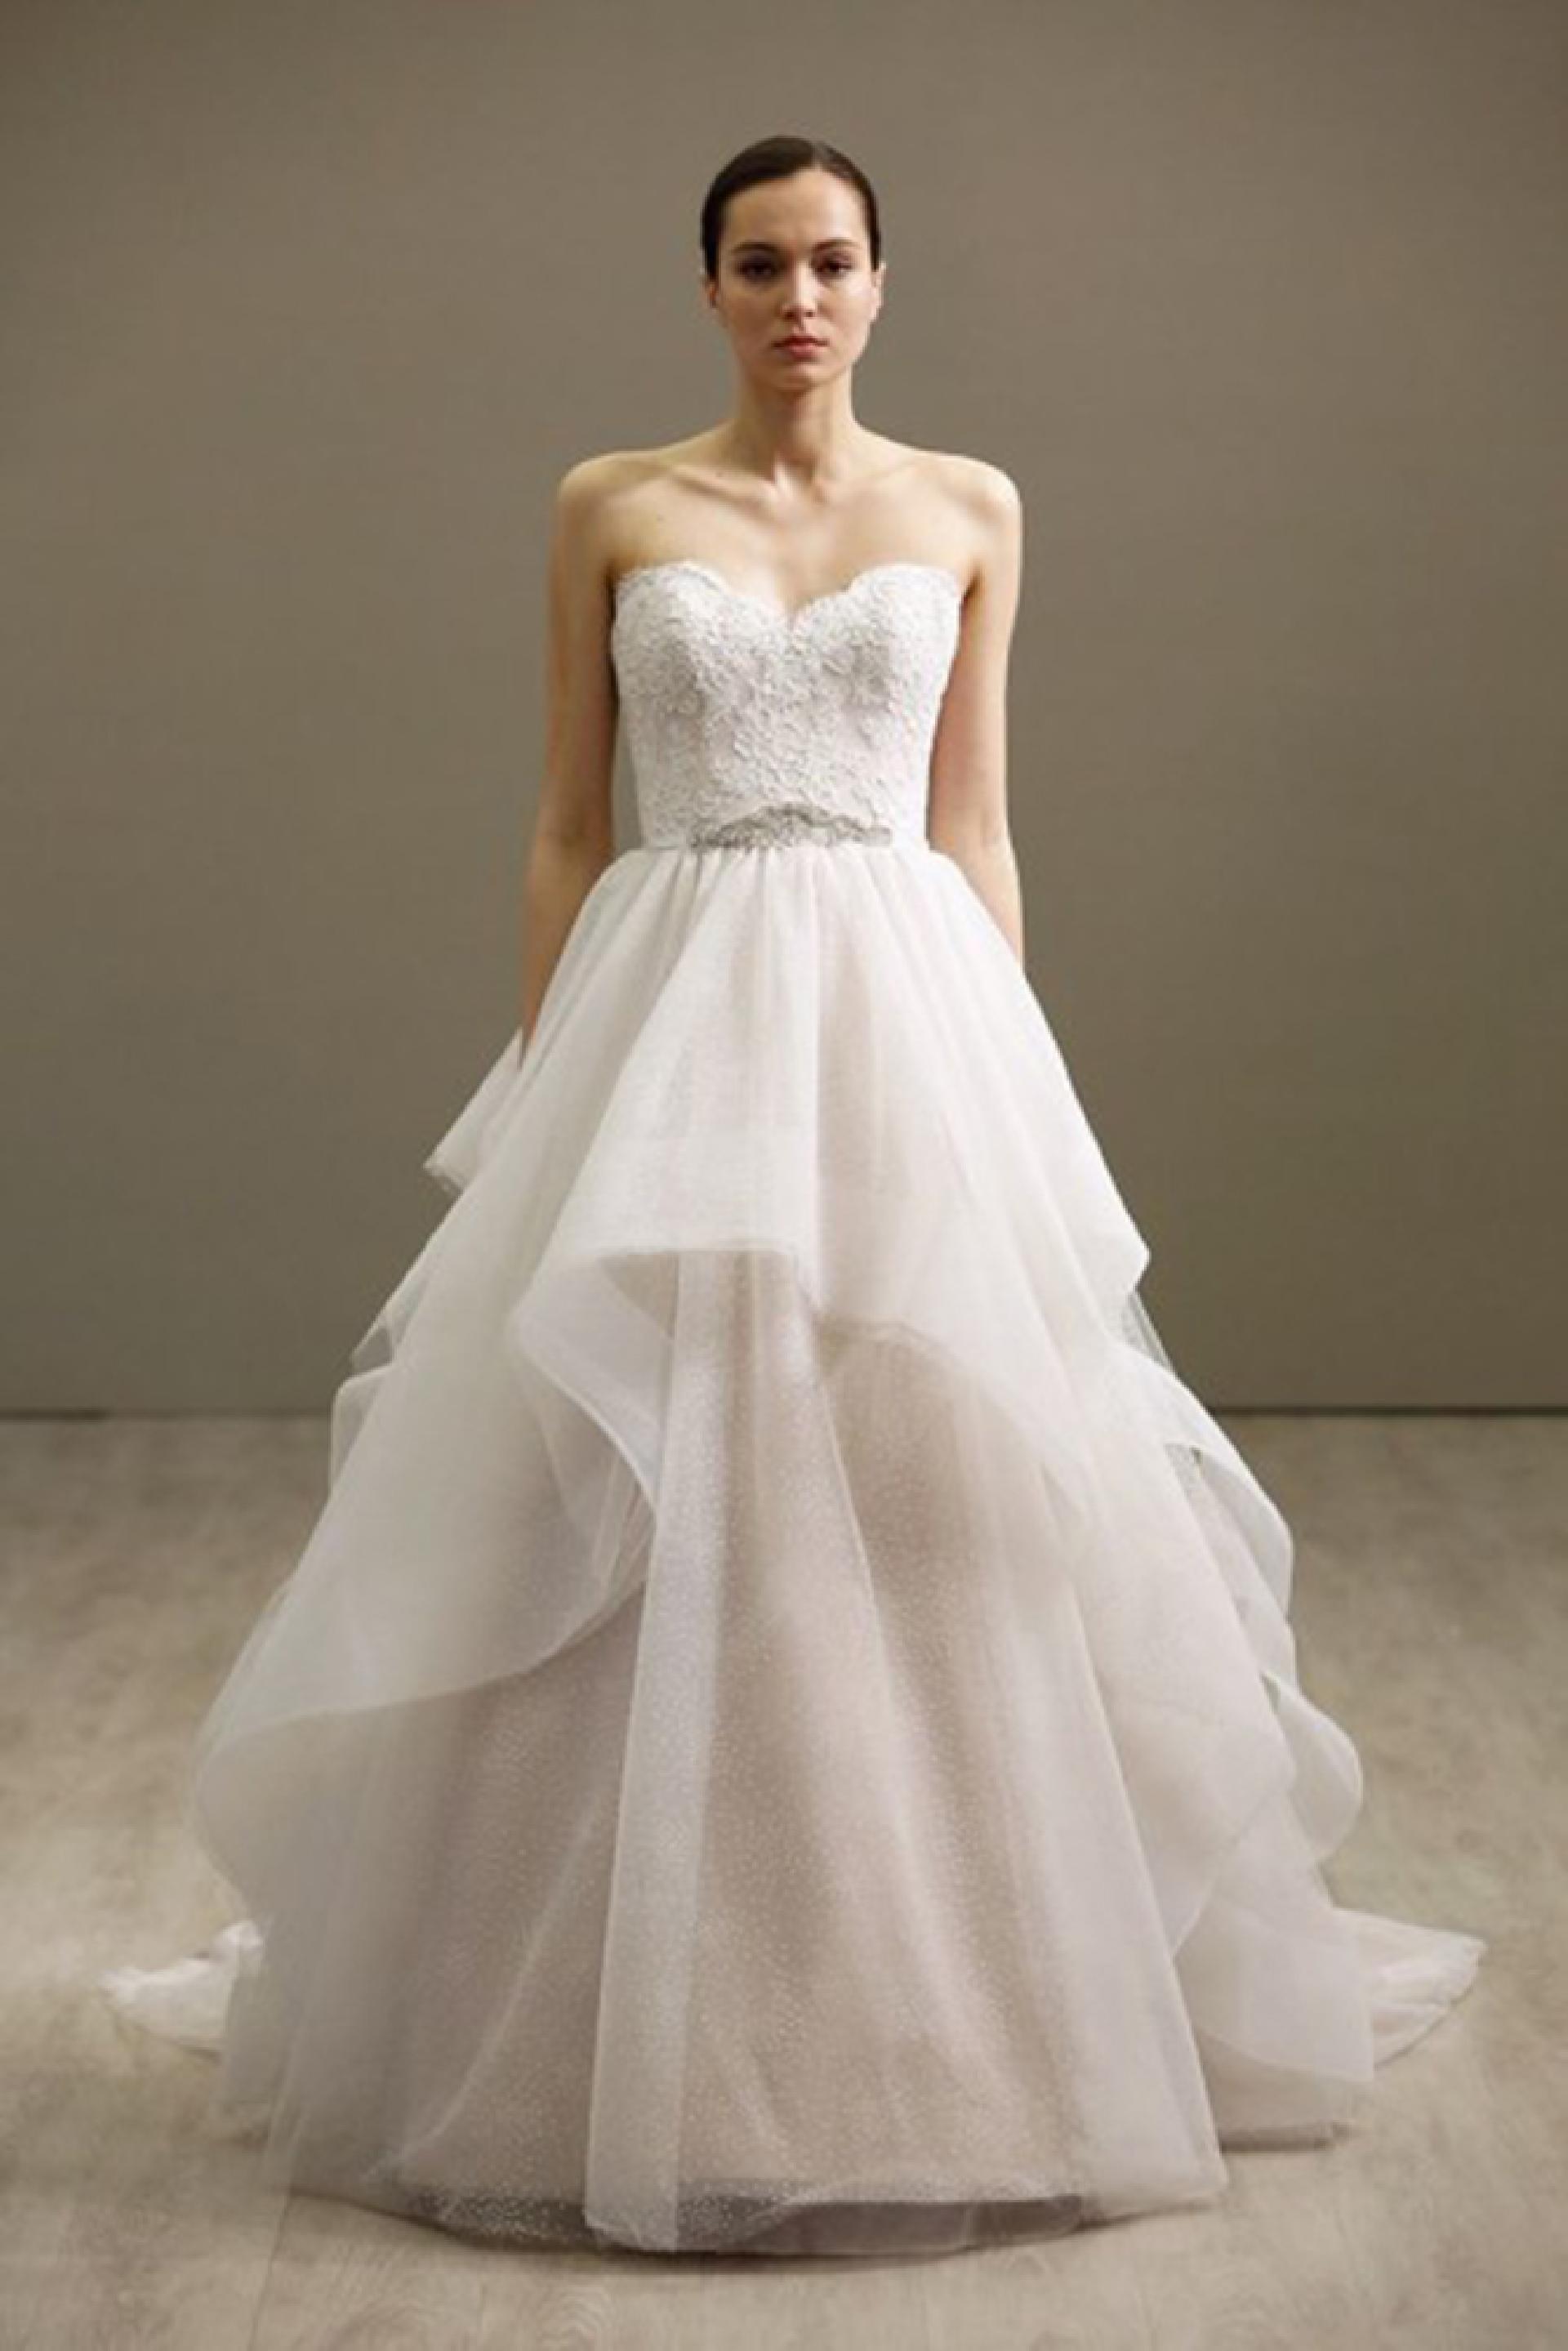 Alvina valenta wedding dresses charleston bridal shope for Wedding dresses images photos